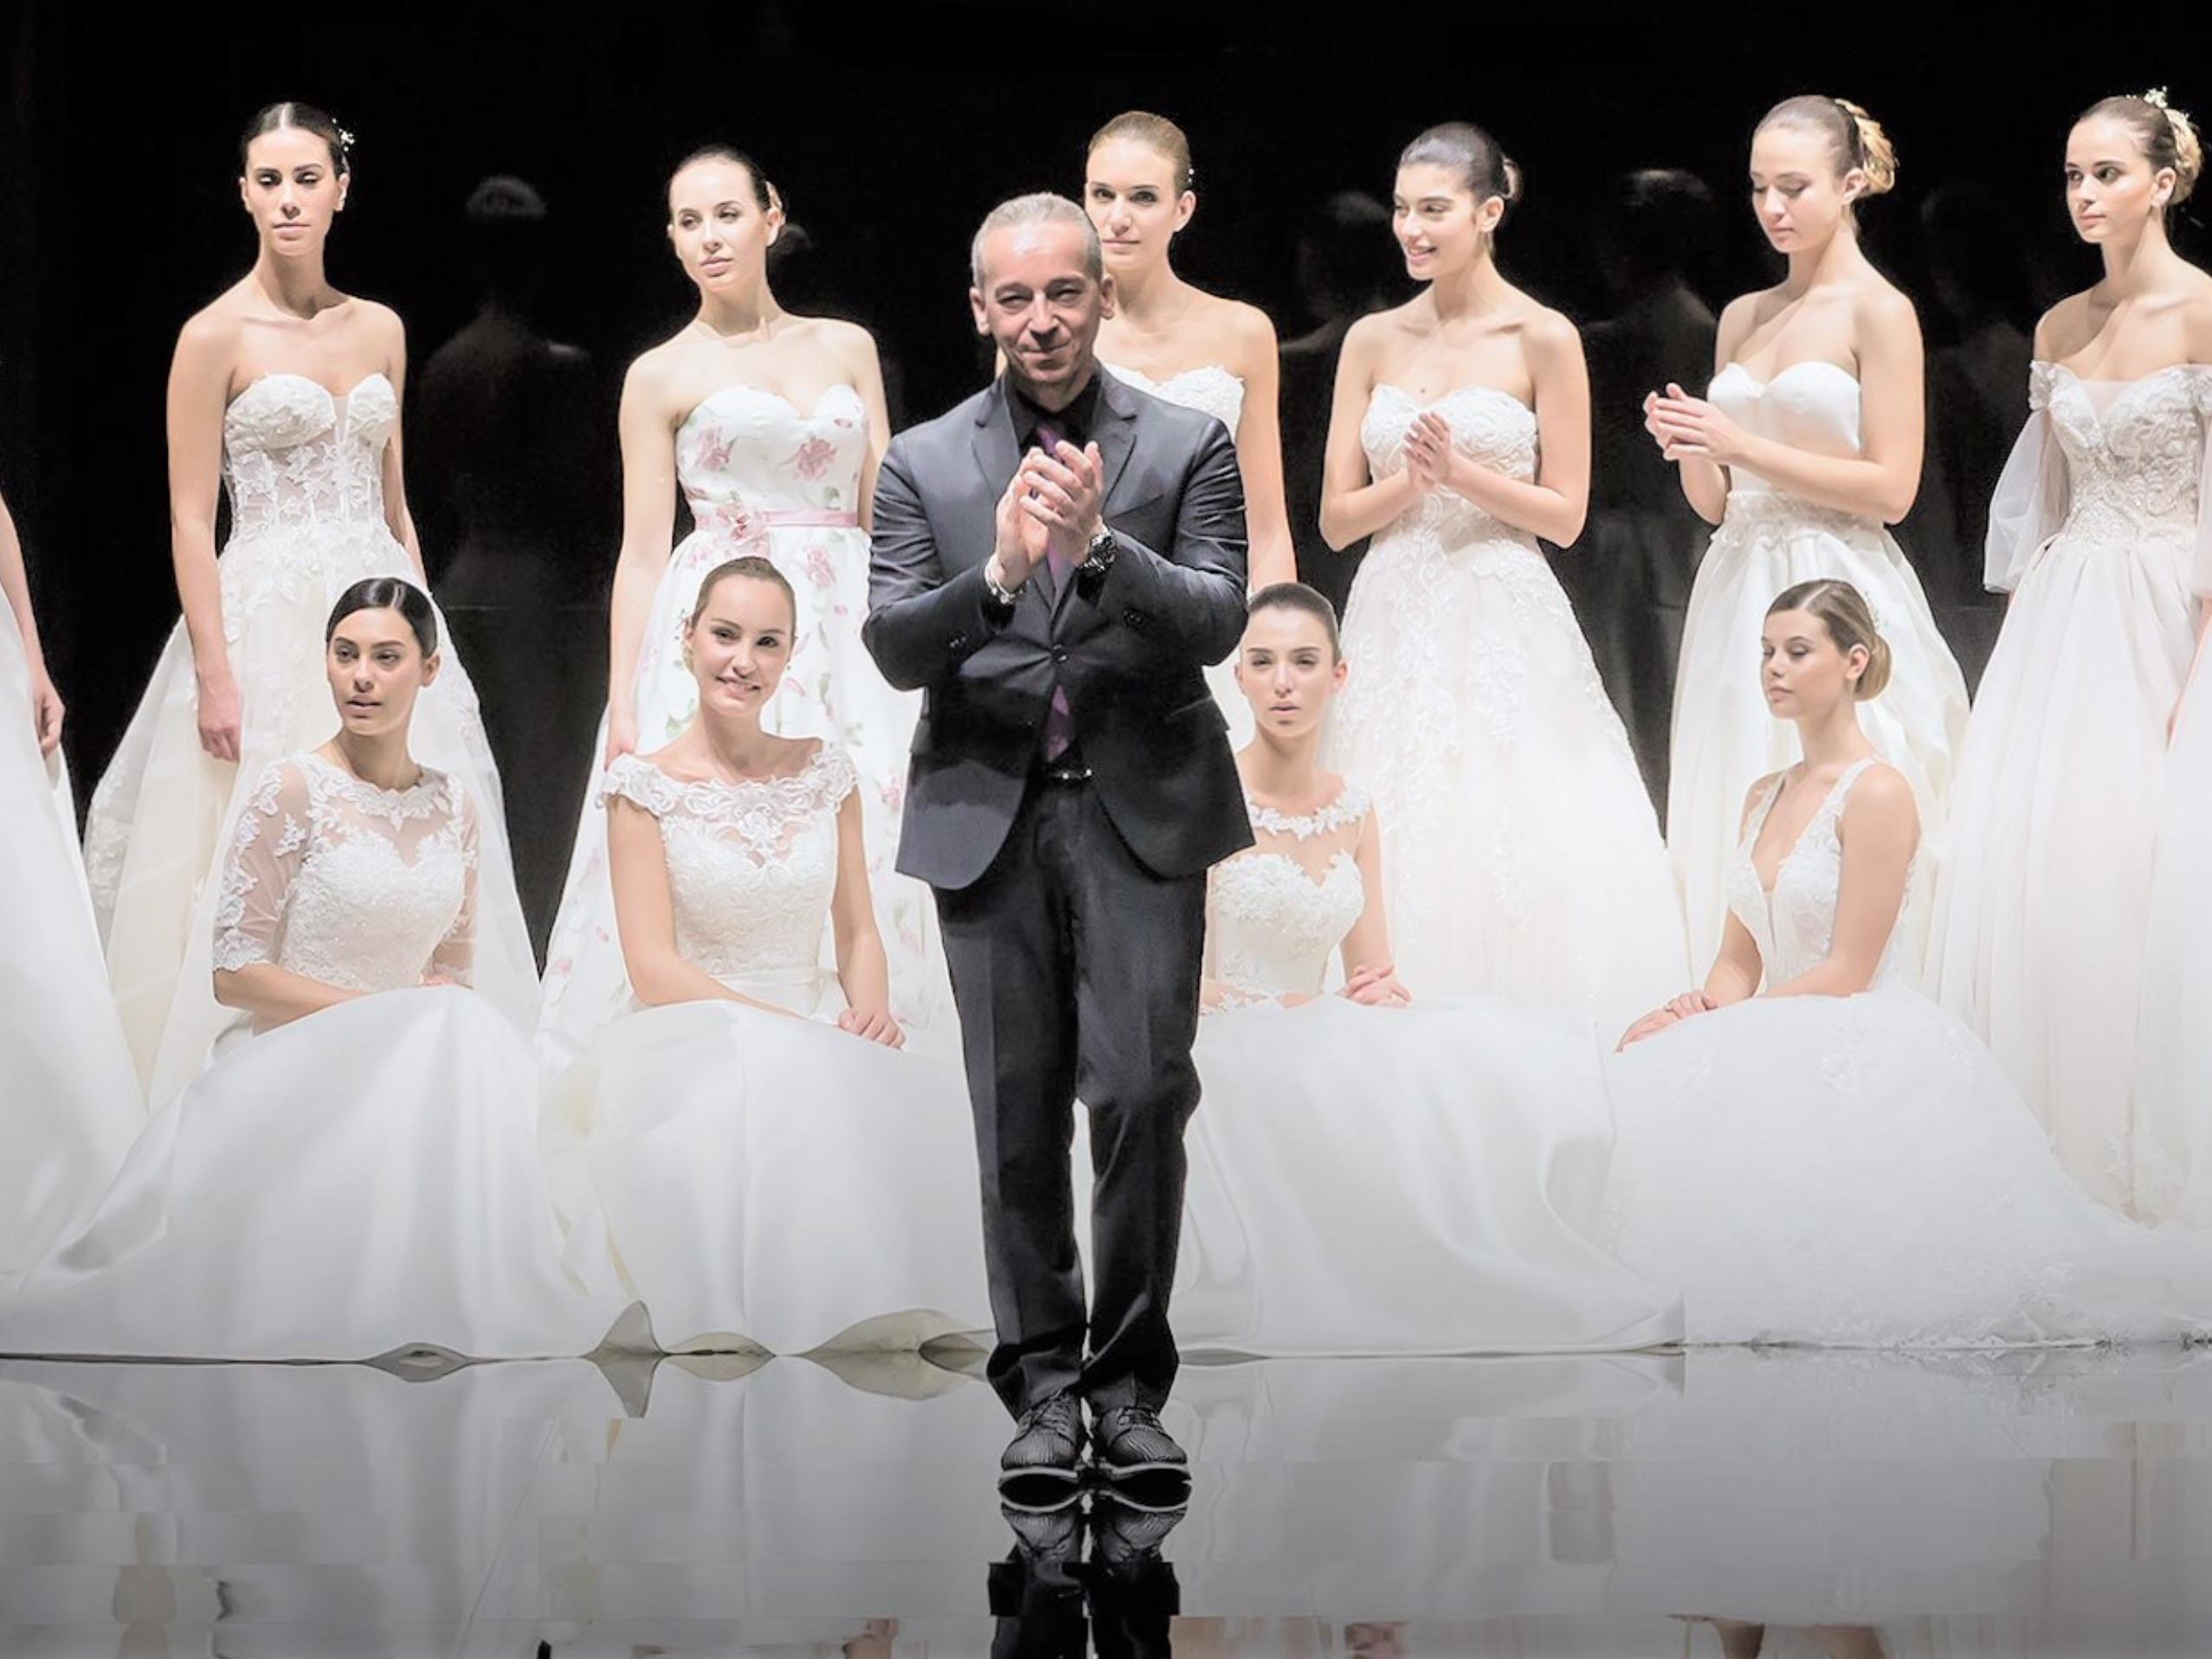 Confesercenti Campania, l'imprenditore Luigi Auletta nominato coordinatore wedding